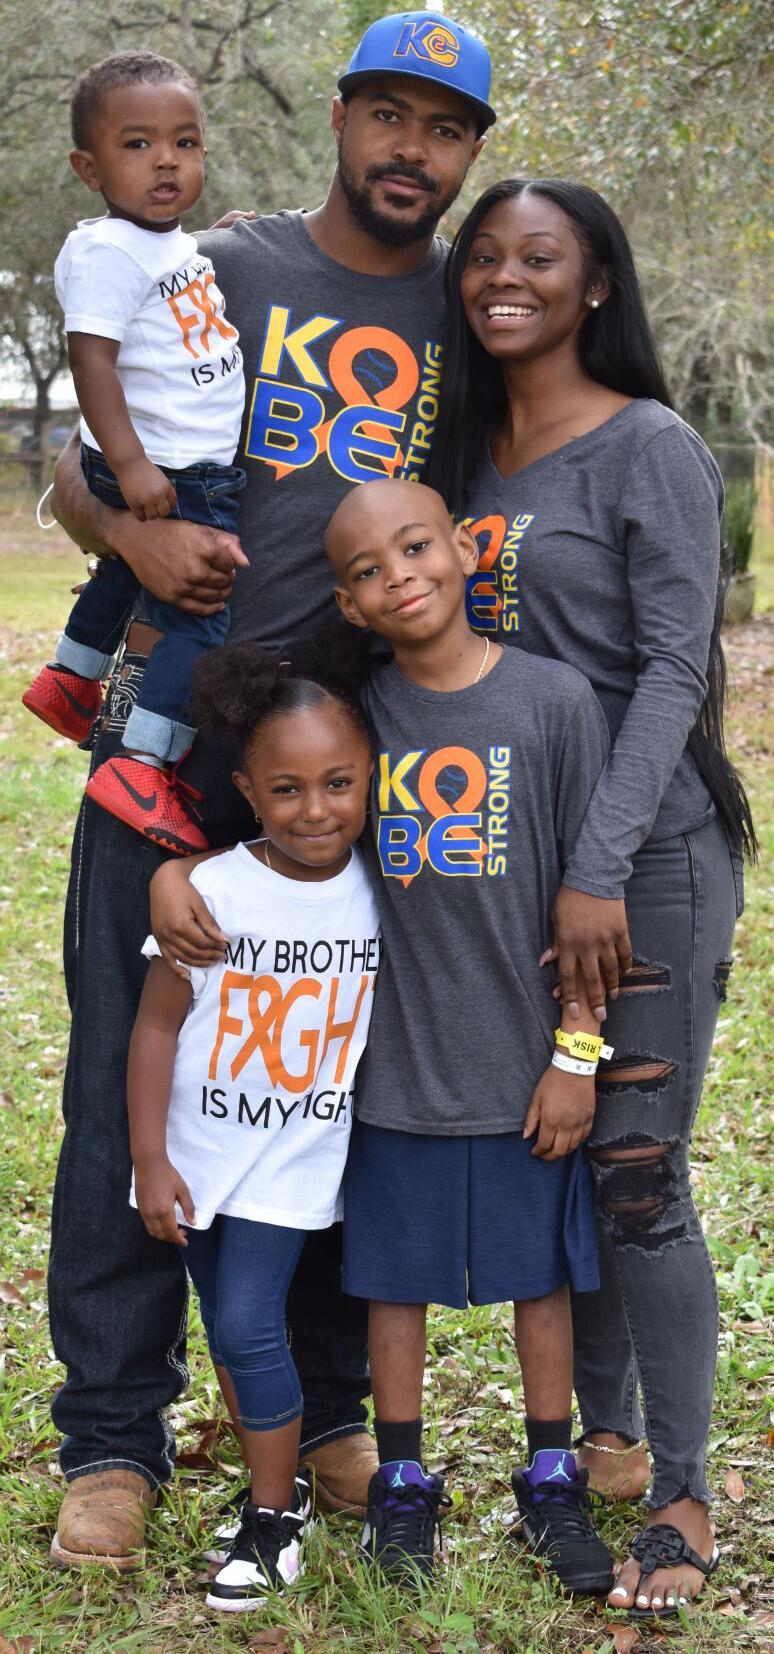 Kobe Washington surrounded by his family sister Kailyn, brother Kason, father Jordan Washington and mother Imeria Price